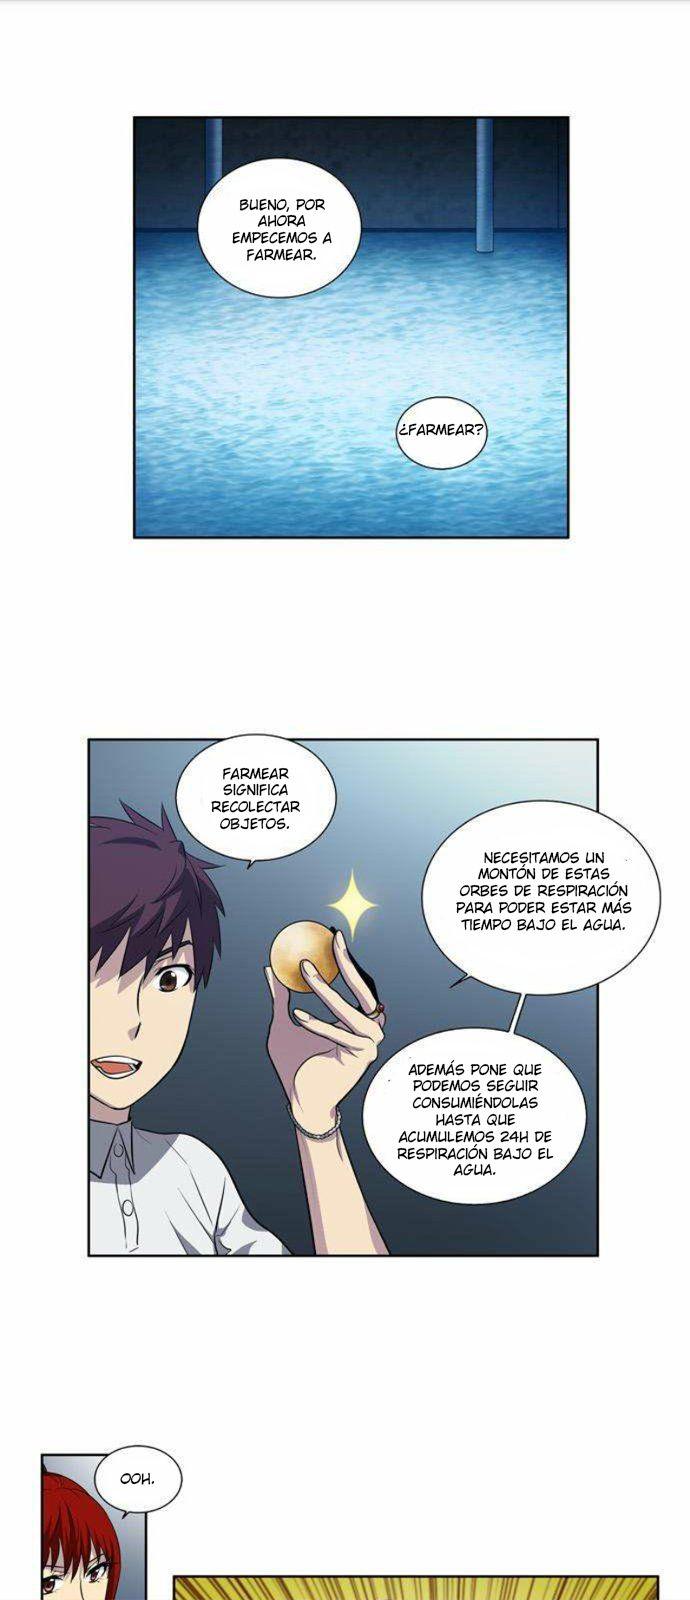 http://c5.ninemanga.com/es_manga/61/1725/487801/28bda53c86d37e275a3ebfdc113b1f59.jpg Page 9